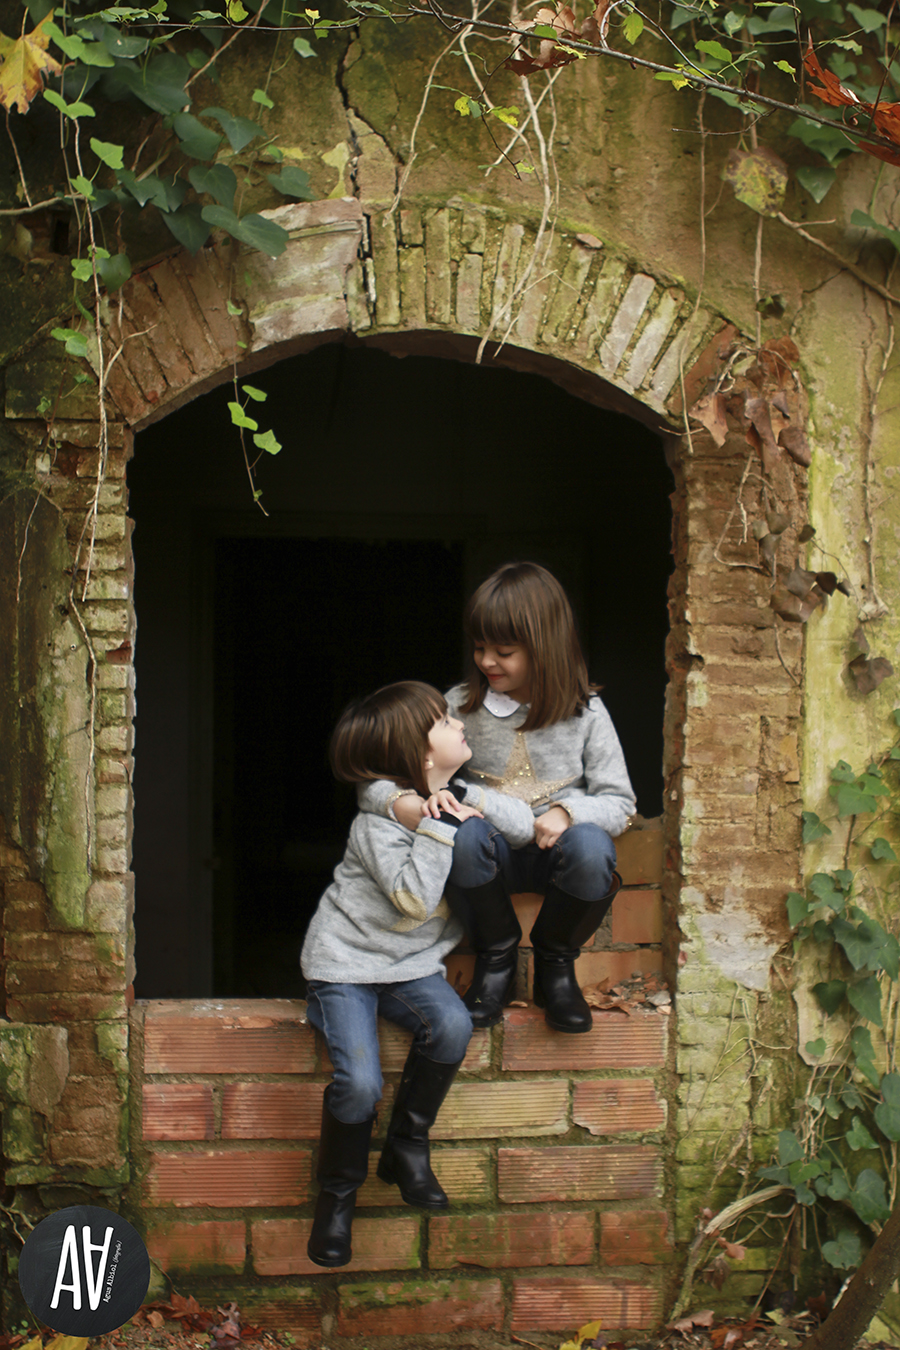 34-sesion familiar y niños barcelona - sesiones fotografia exterior - agus albiol fotografia